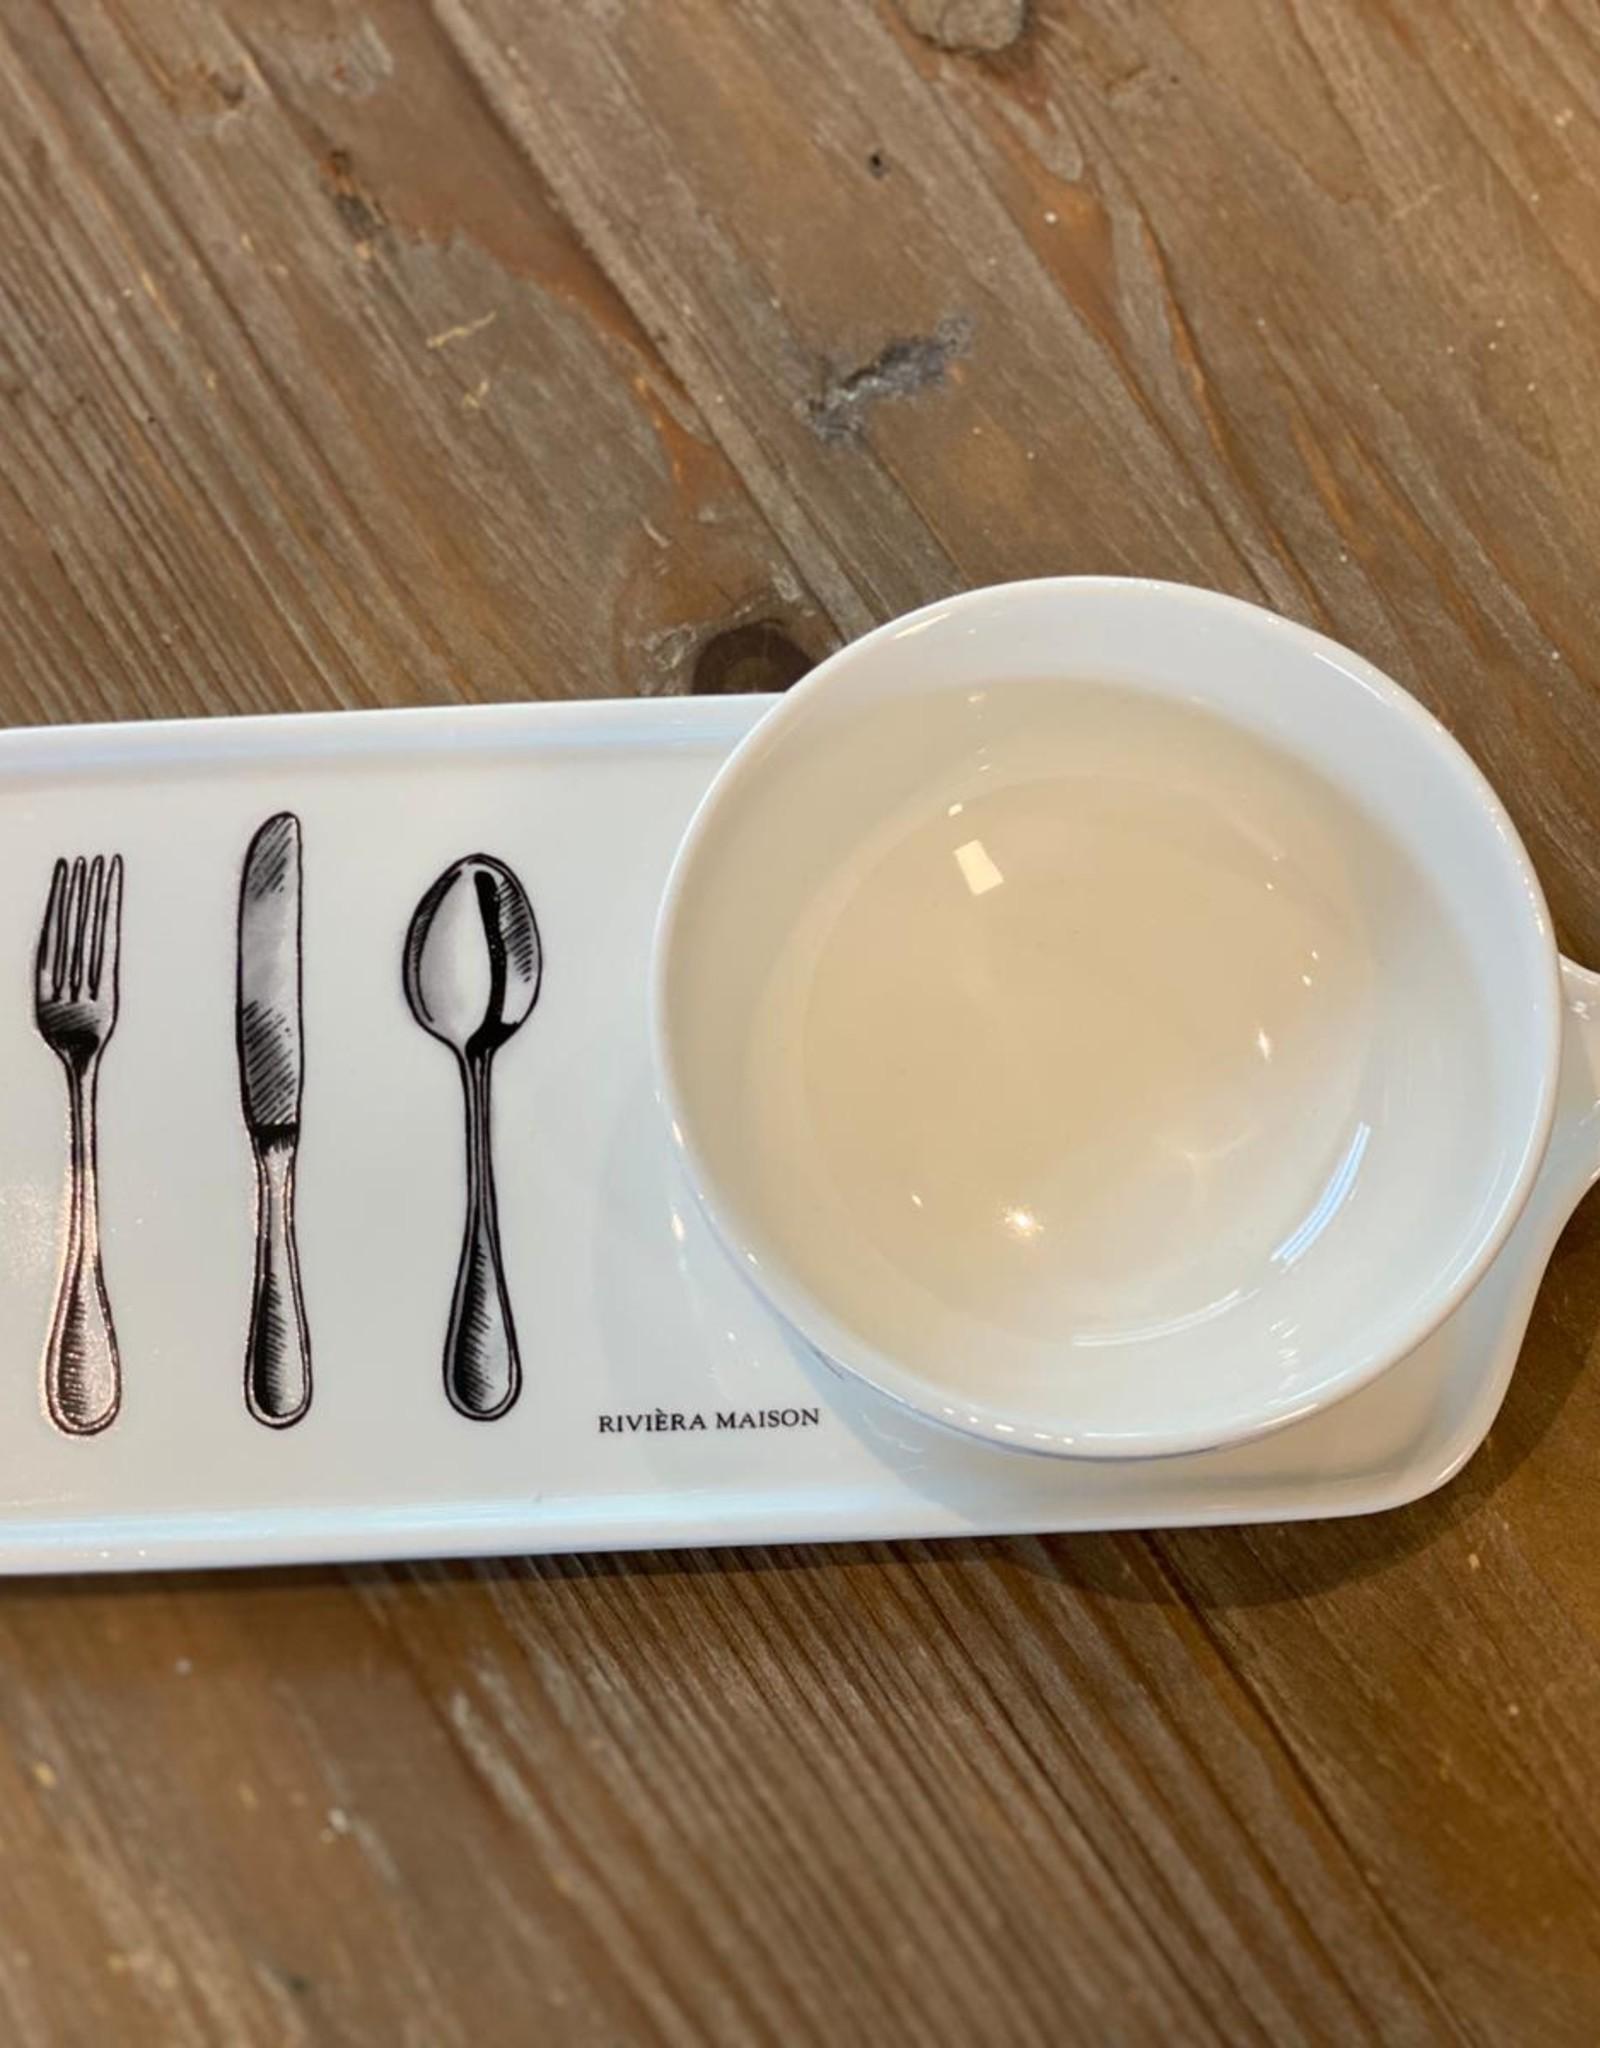 Riviera Maison Chef's Special Dinner Set